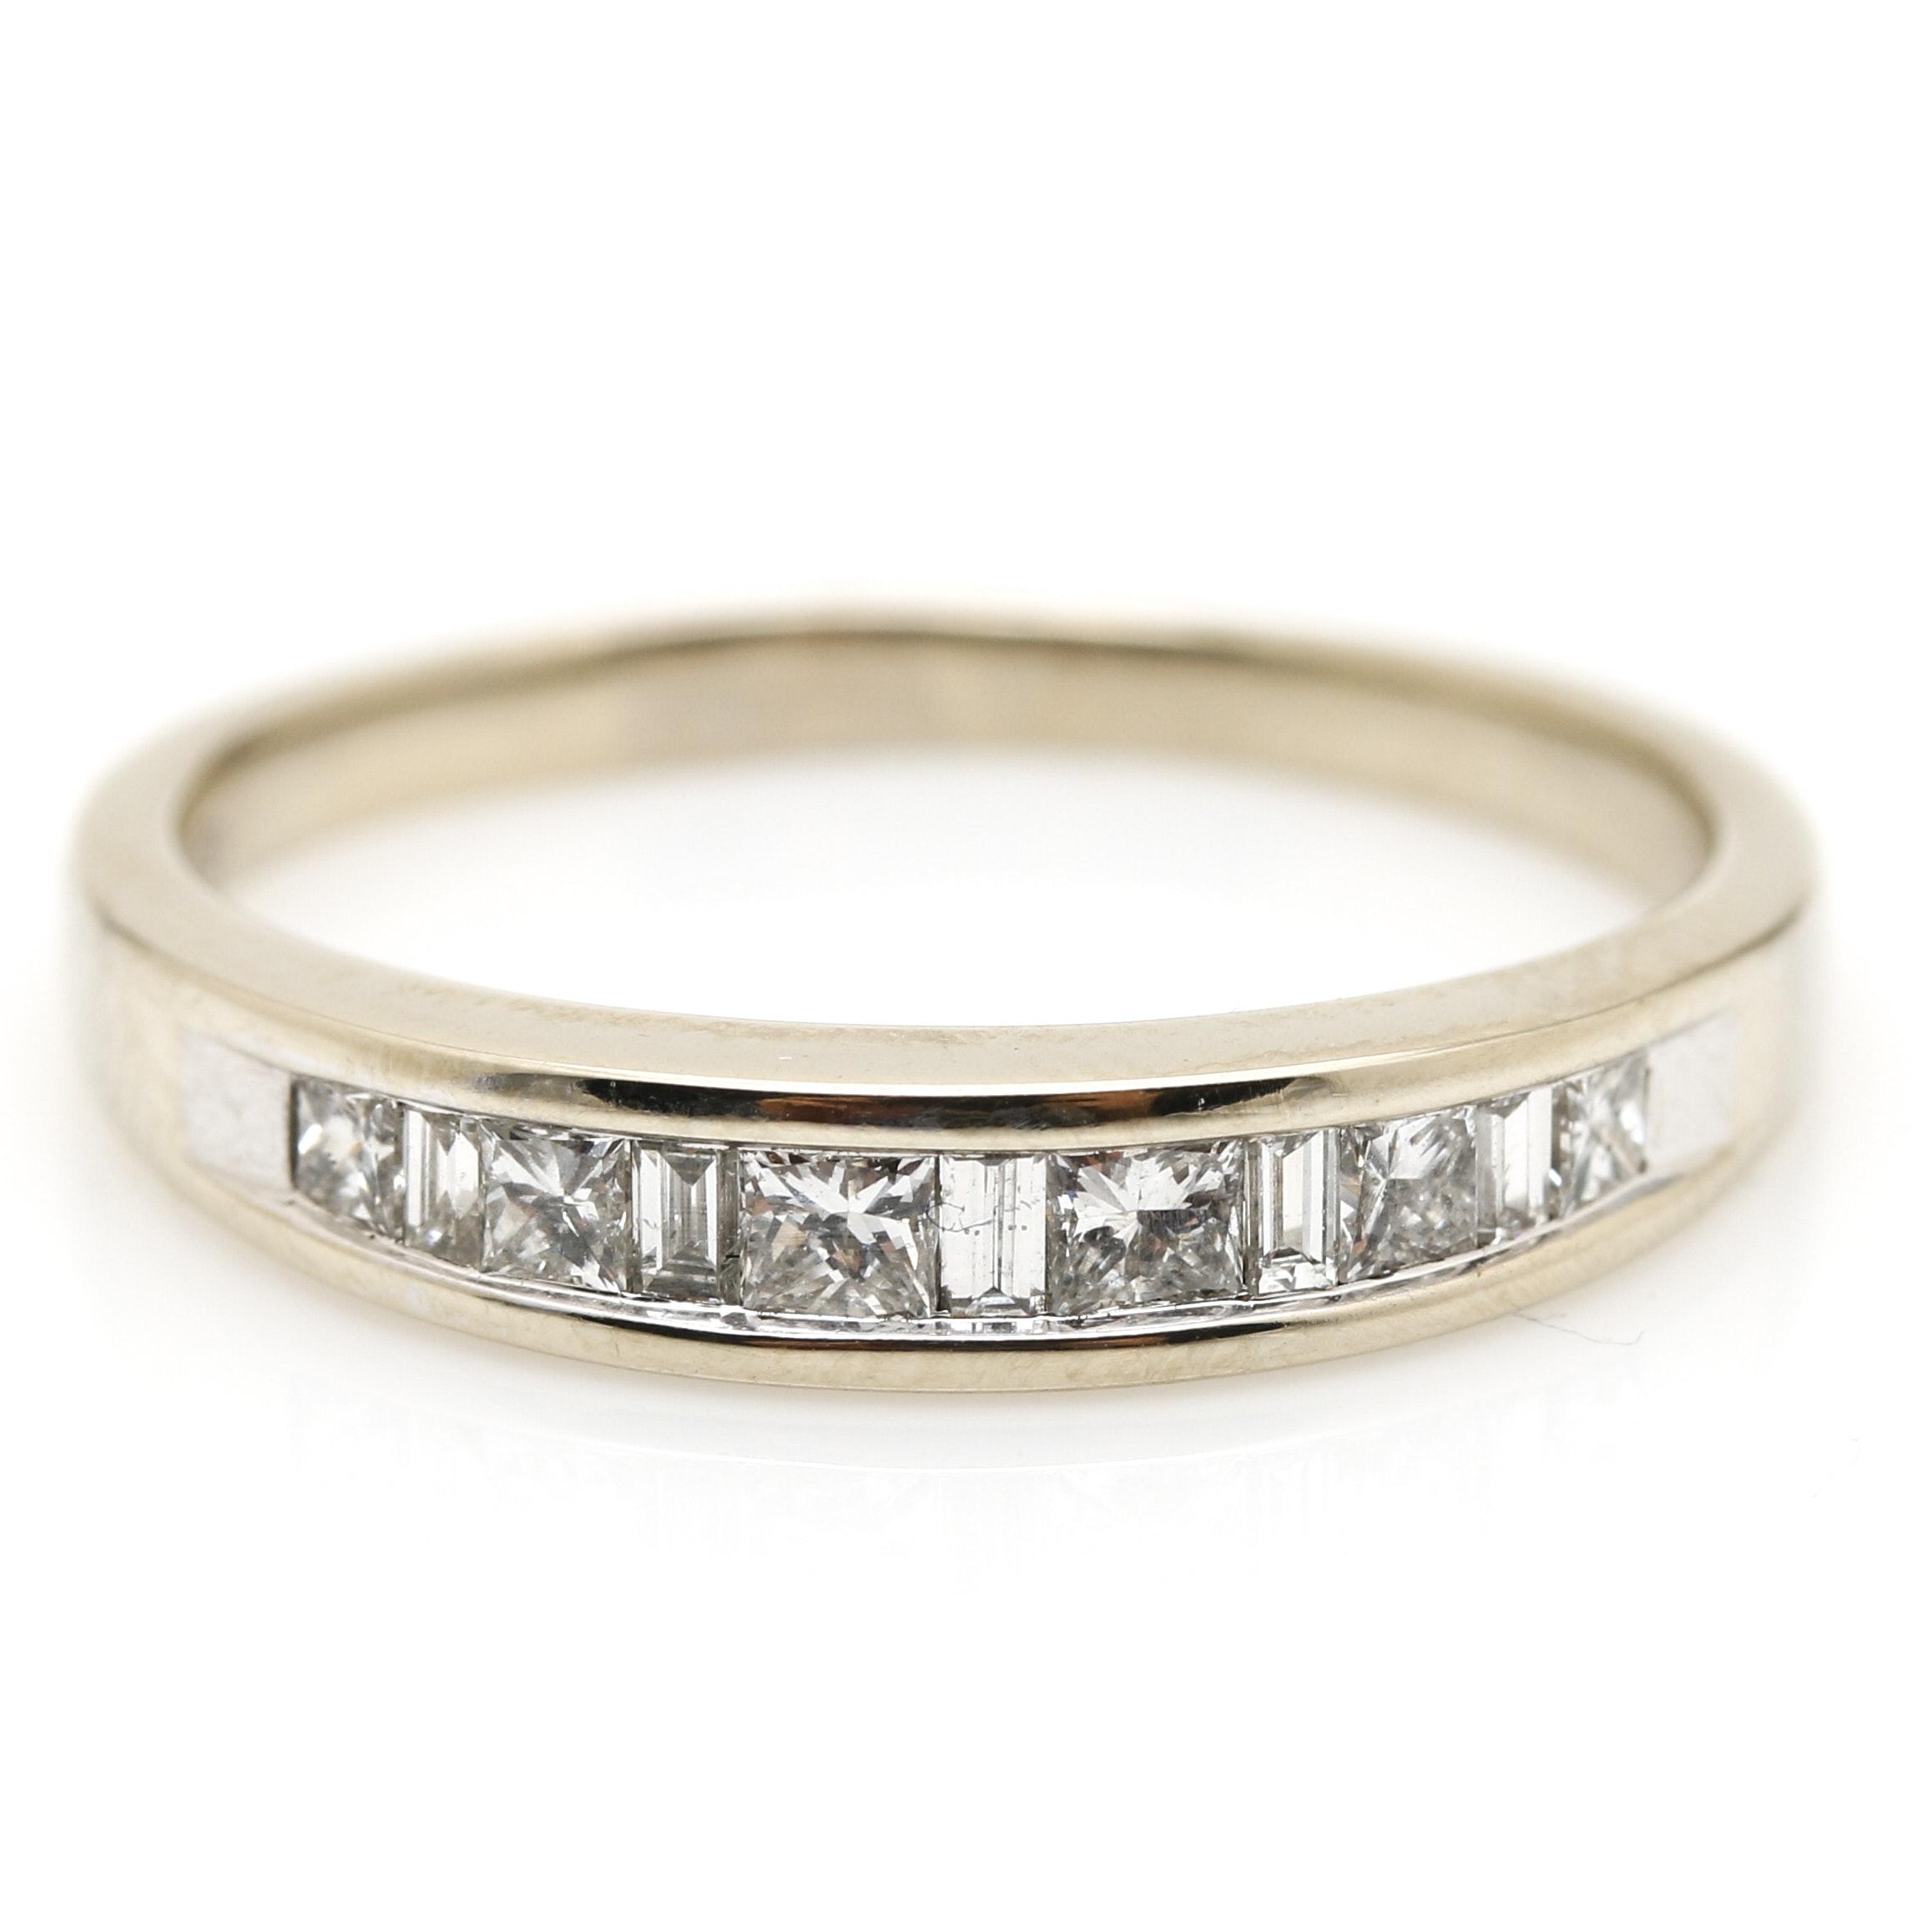 14K White Gold 0.62 CTW Diamond Band